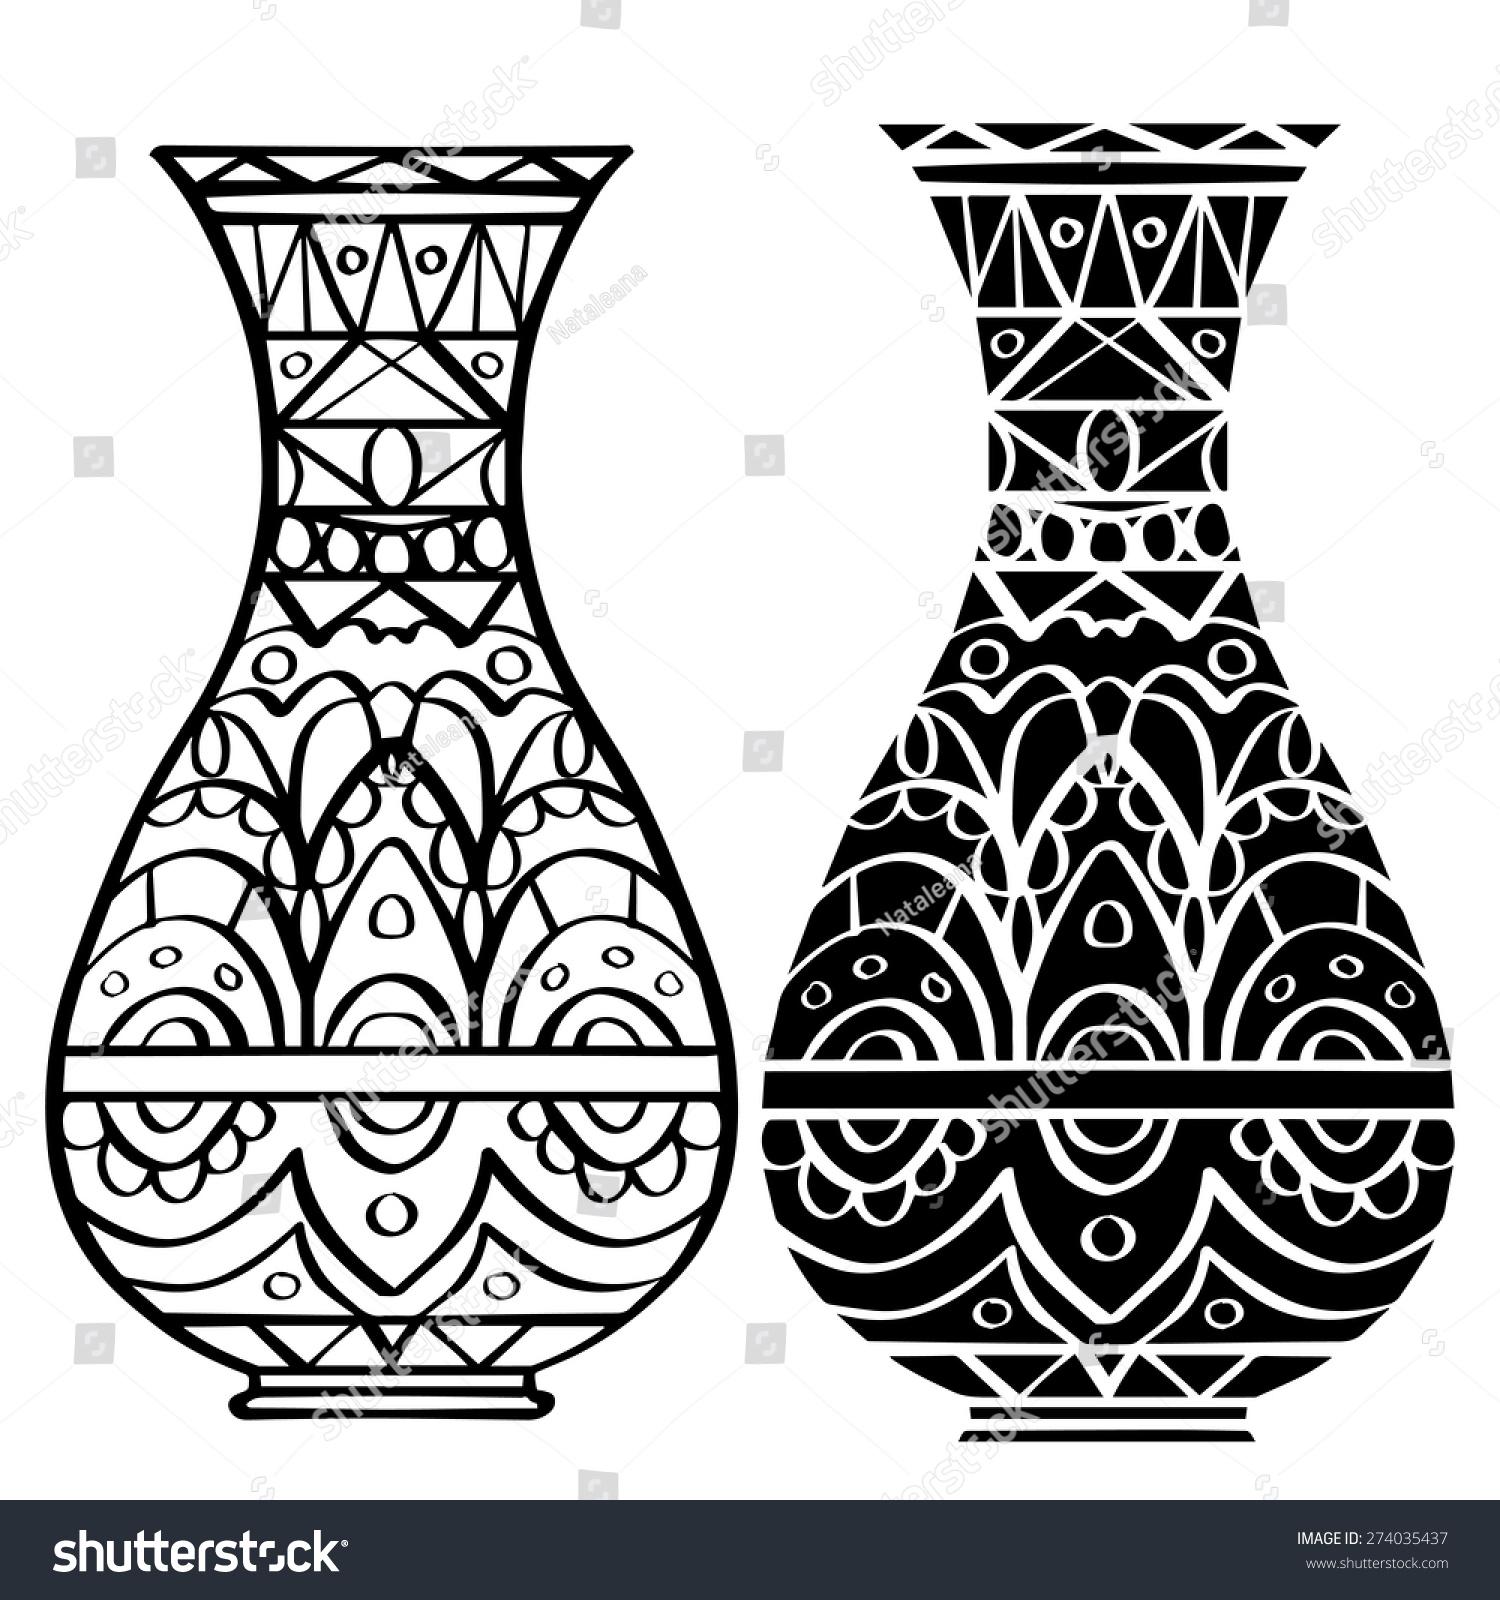 Line Drawing Vase : Hand drawn vase geometric pattern set stock vector